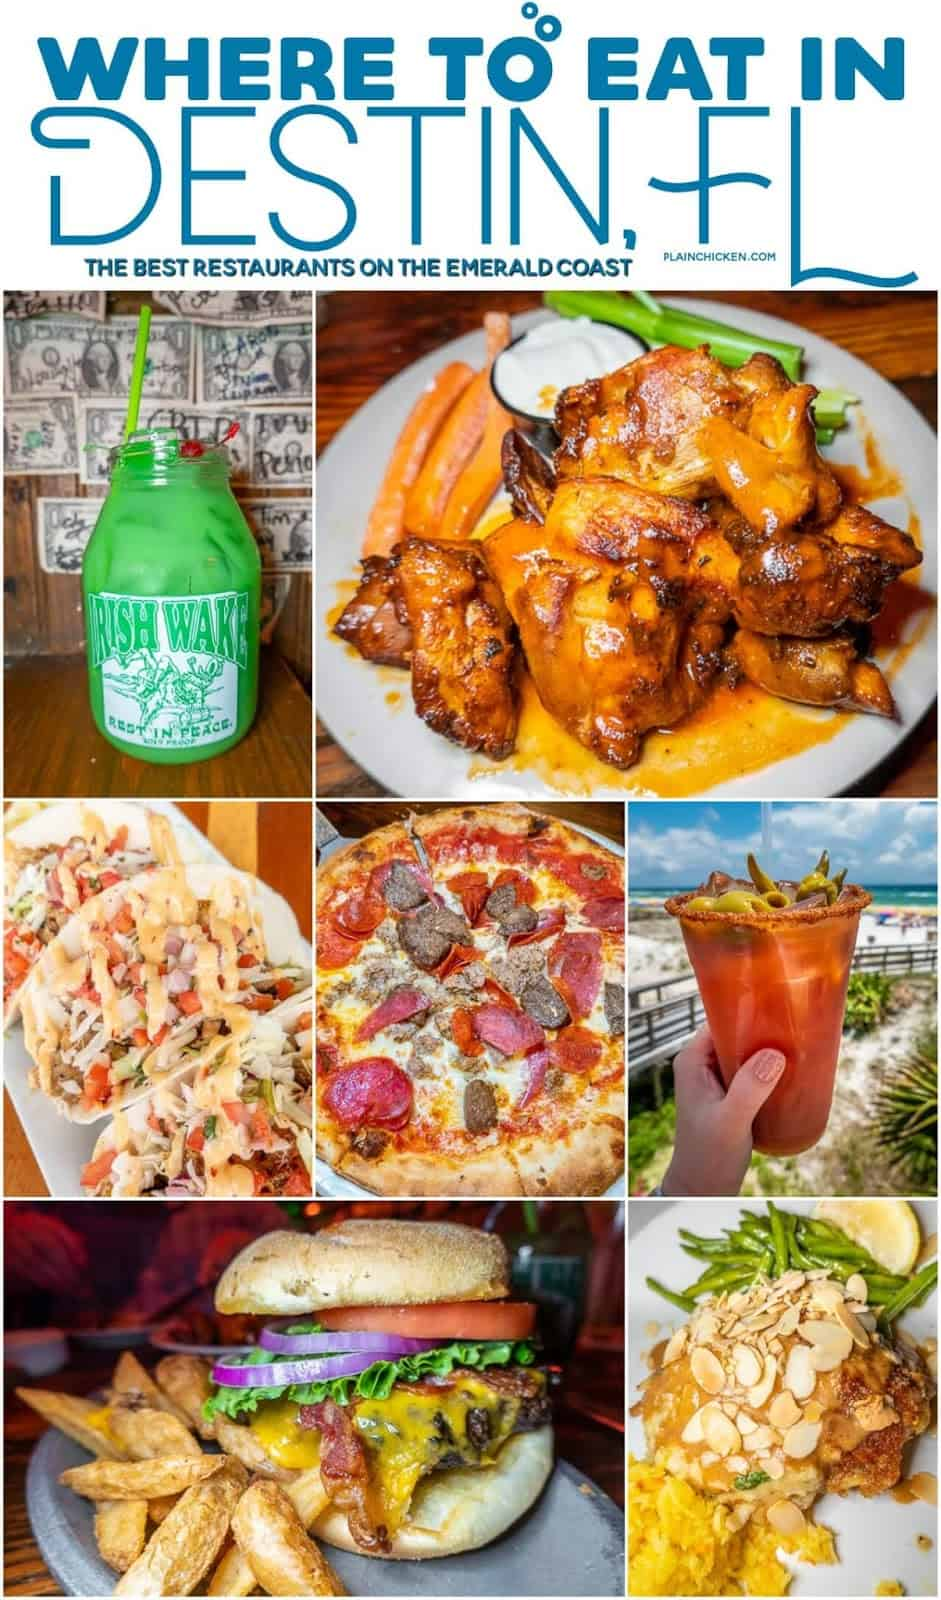 Places To Eat On Christmas Day 2020 In Destin Florida Best Restaurants in Destin, FL   Plain Chicken